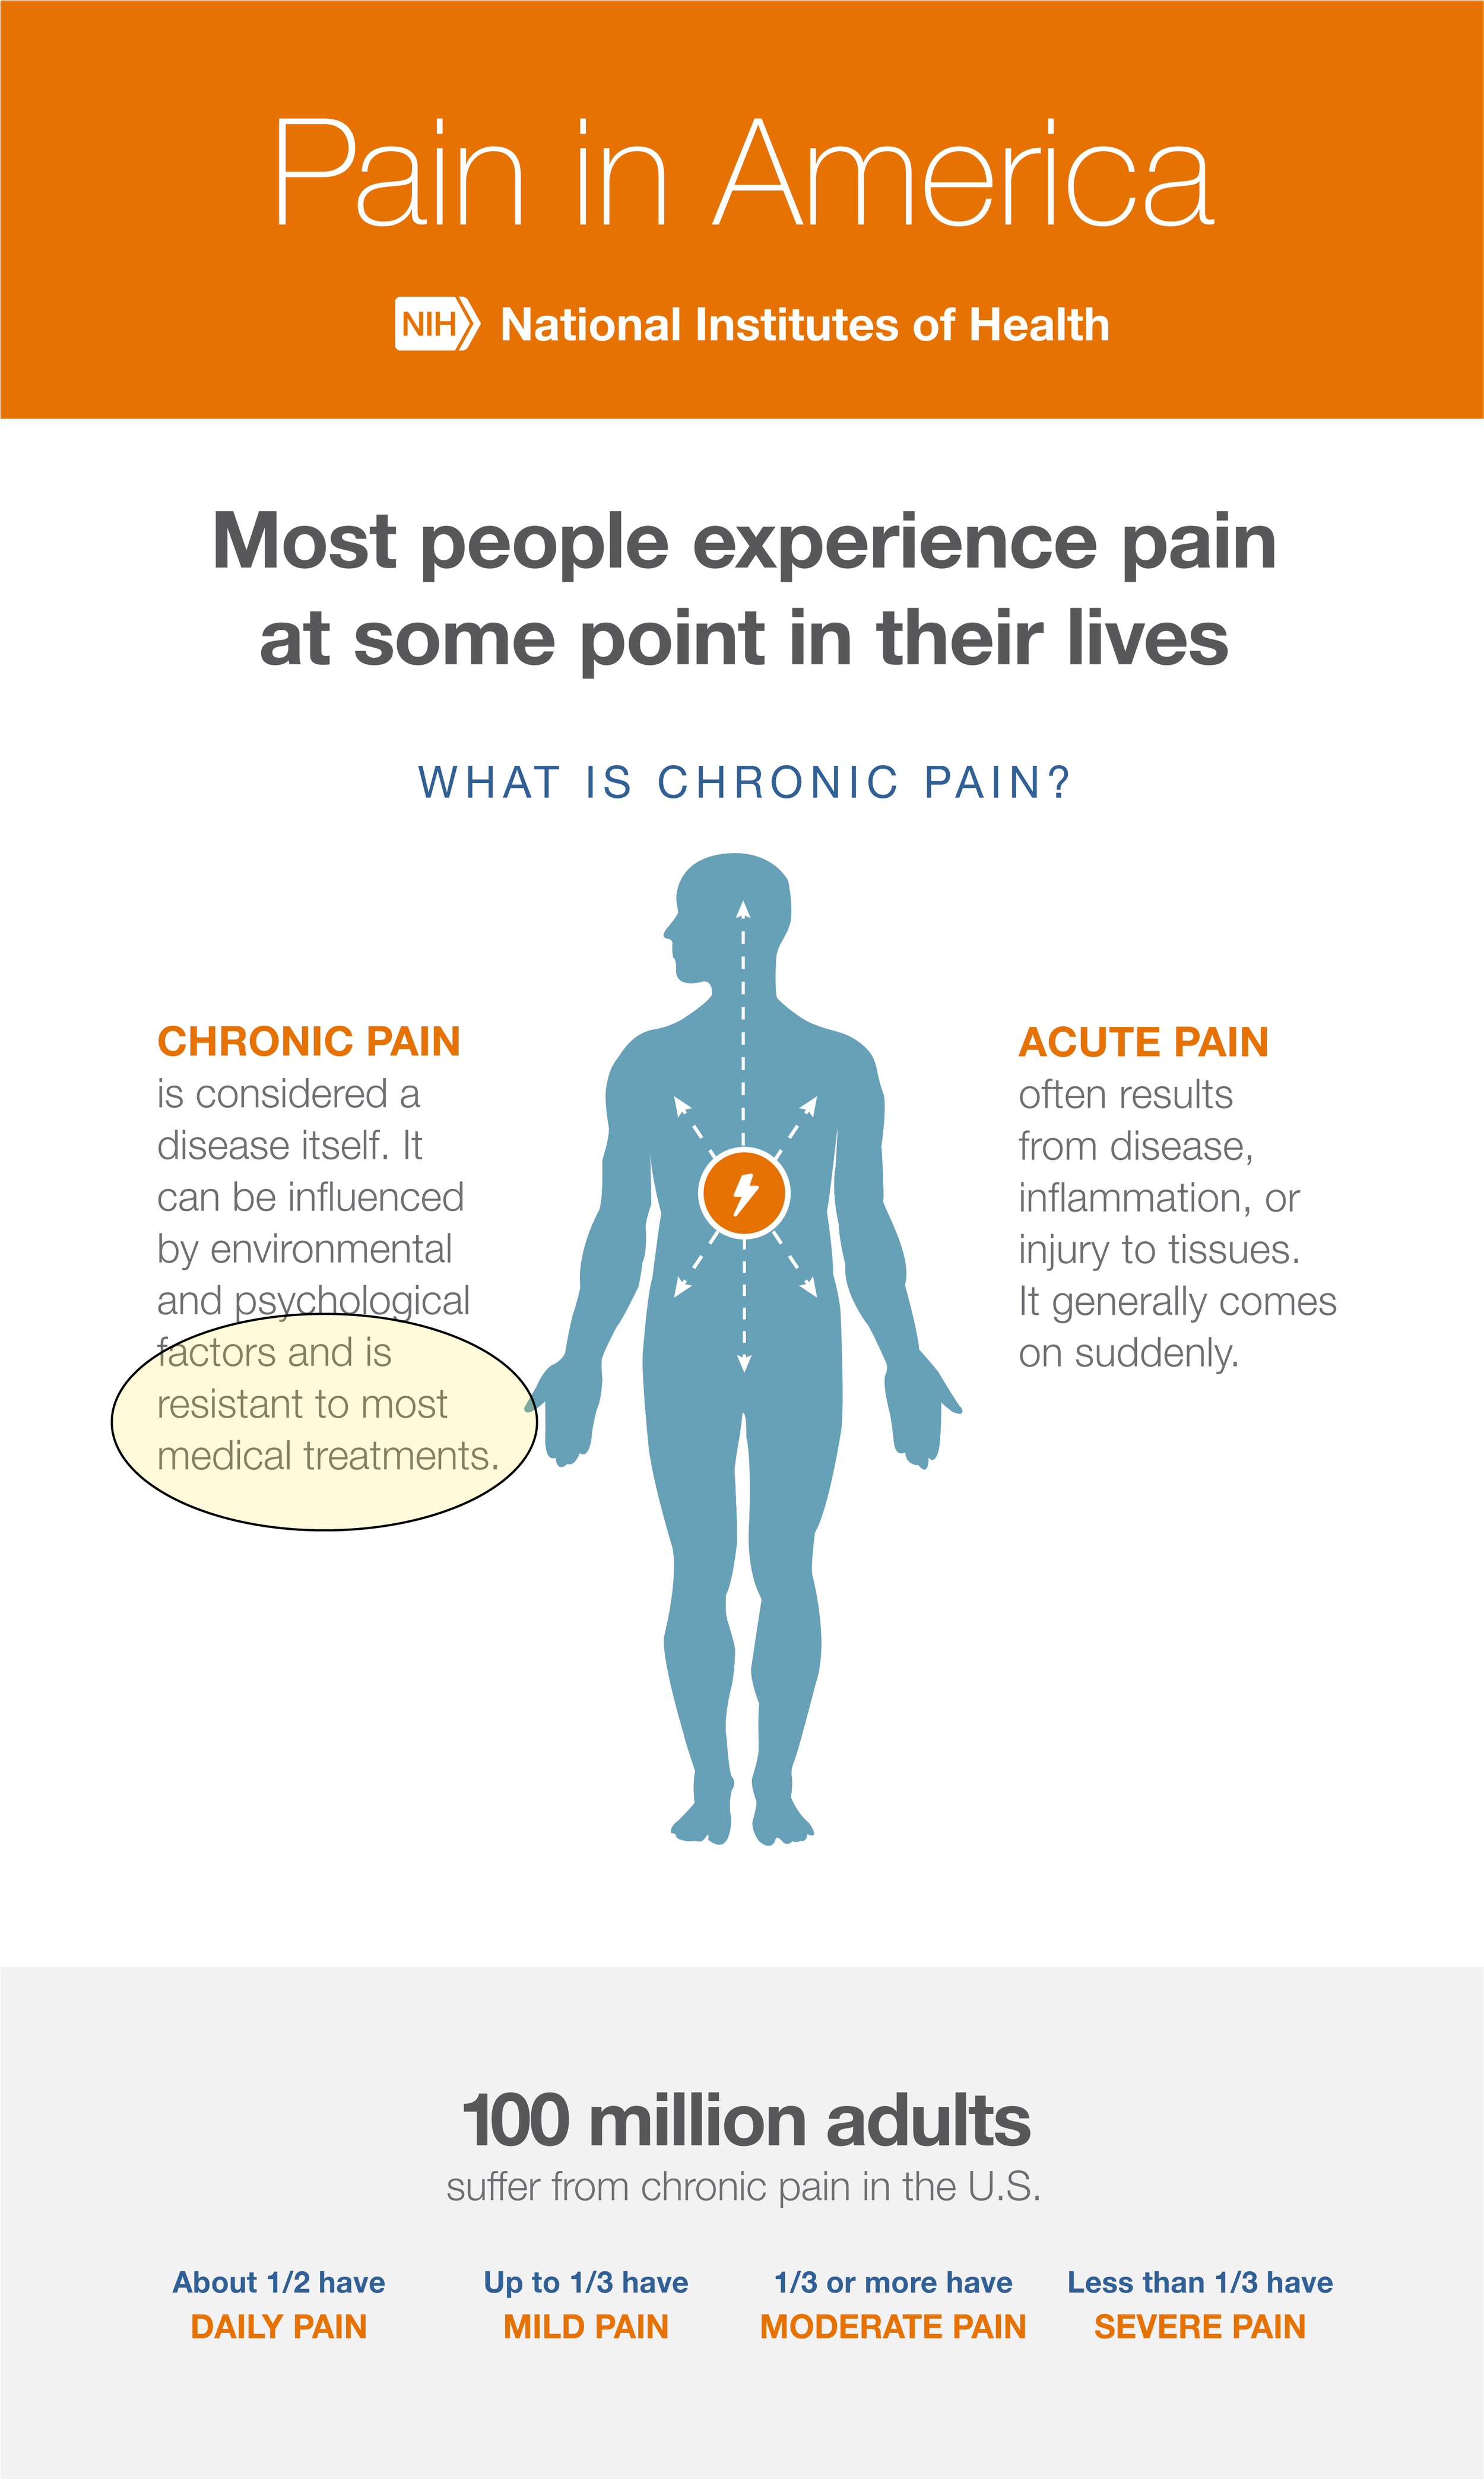 https://www.iprcc.nih.gov/sites/default/files/NINDS-Chronic-Pain-Infographic.pdf